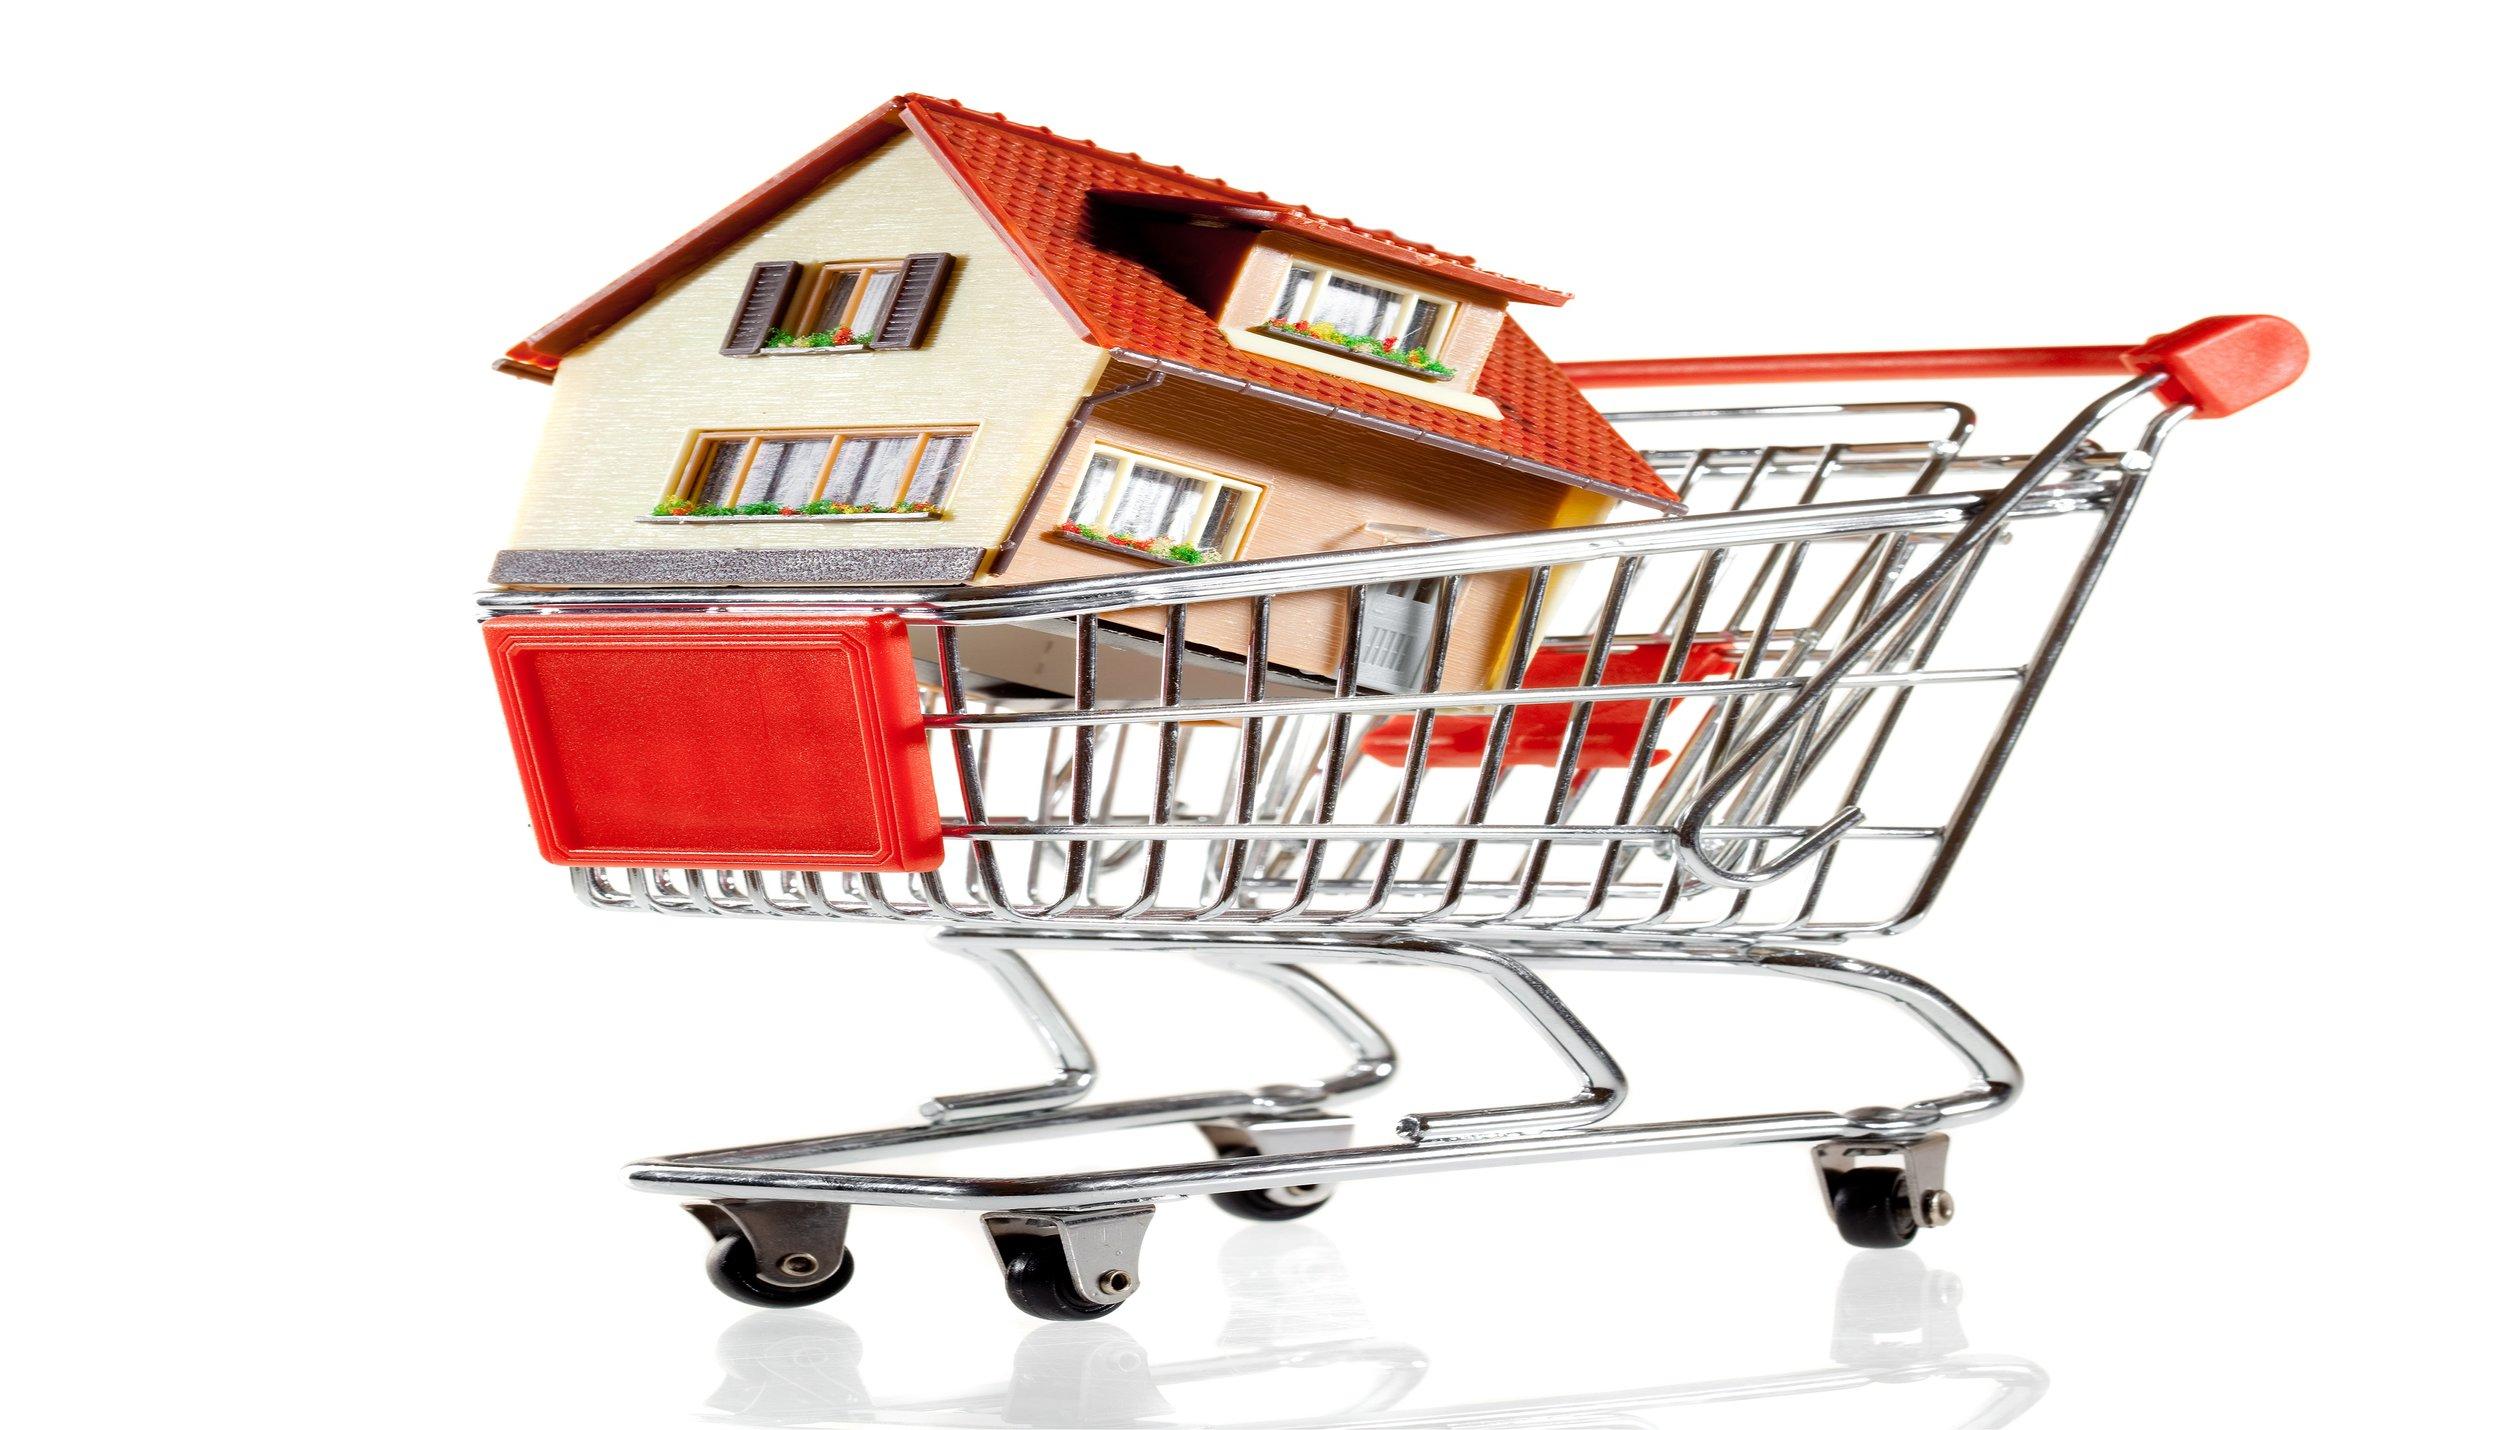 House in cart2.jpg